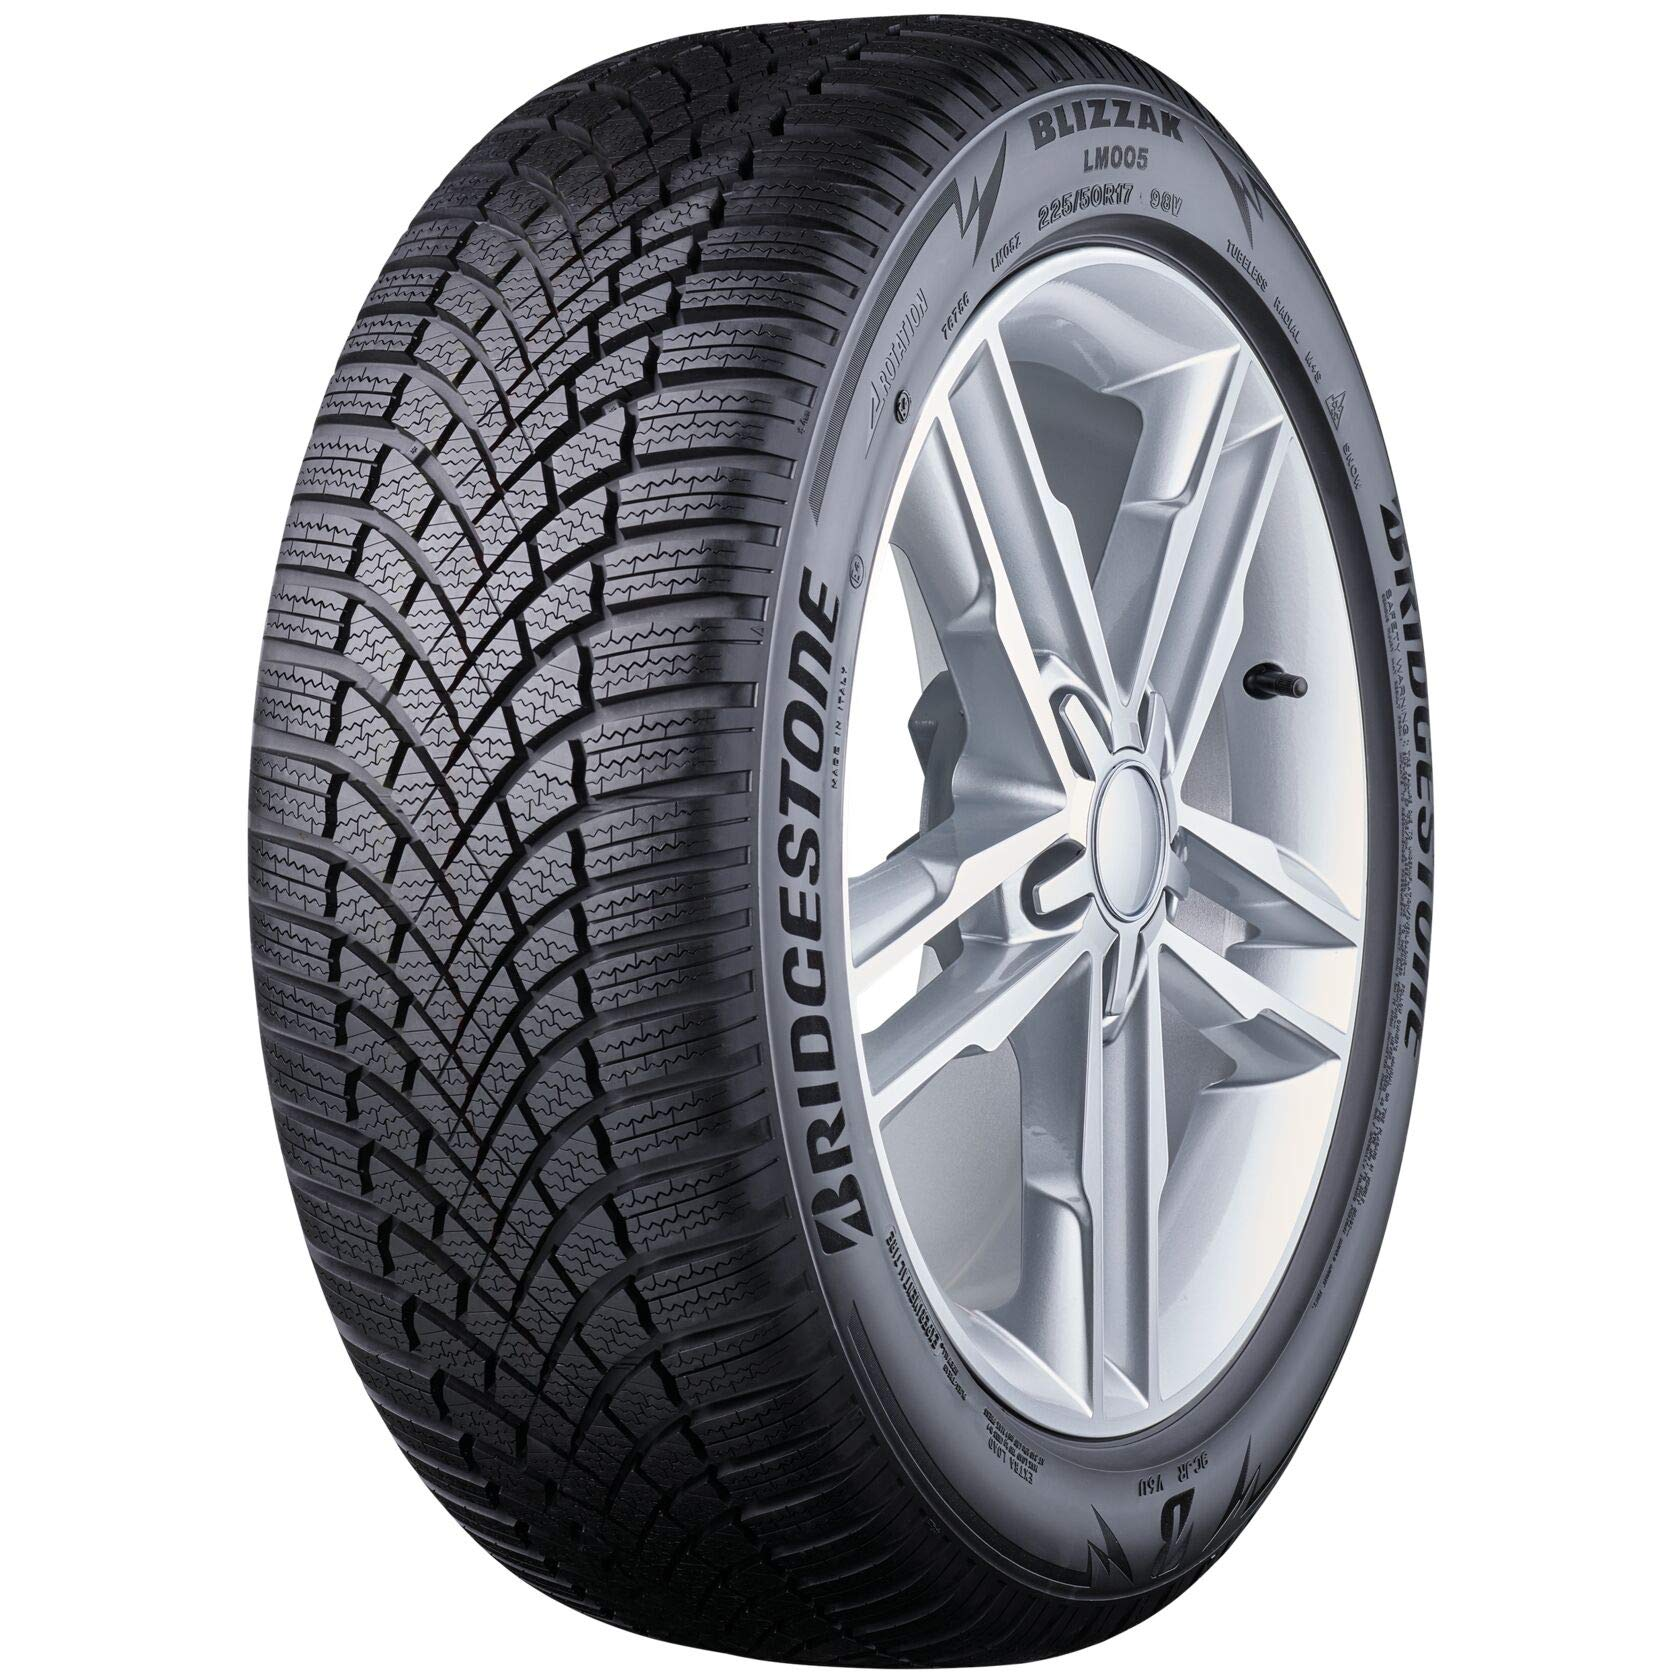 Neumático BRIDGESTONE LM005 235/65R17 108 V